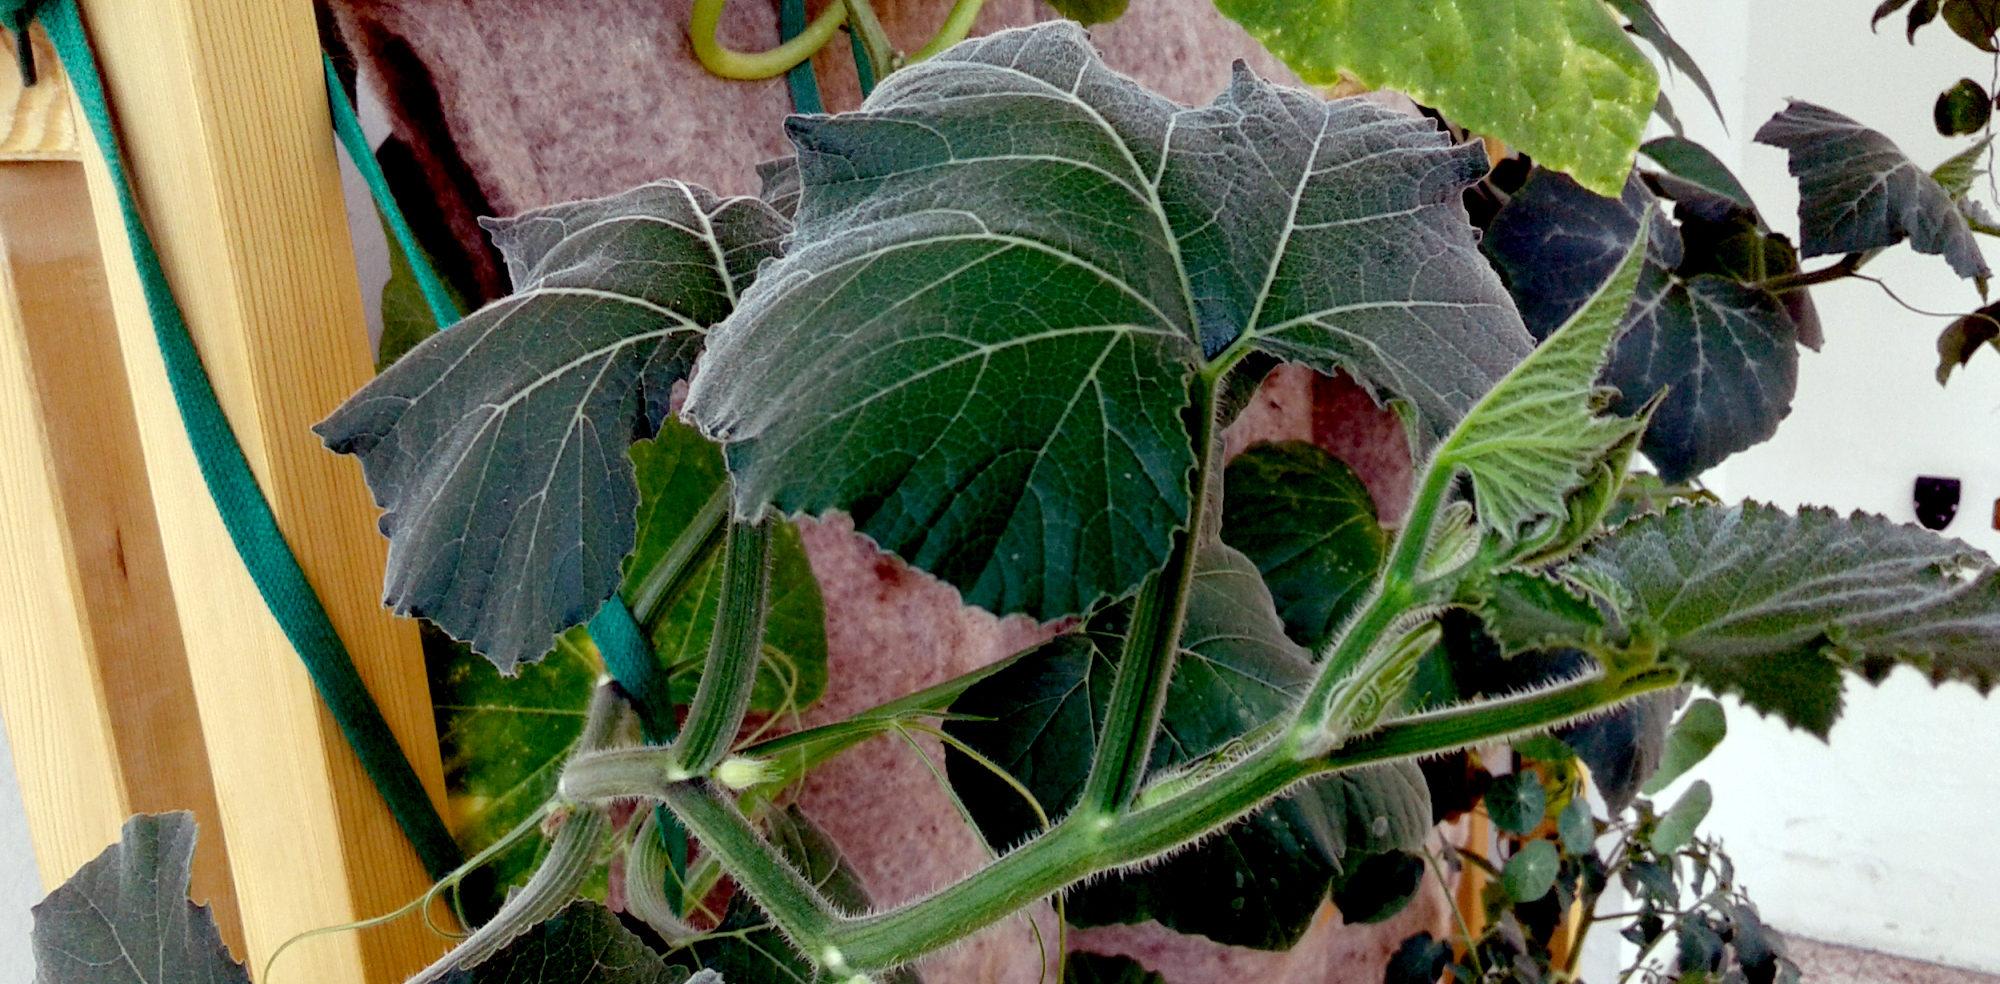 Zucchine d'Albenga su modulo di coltivazione verticale in lana